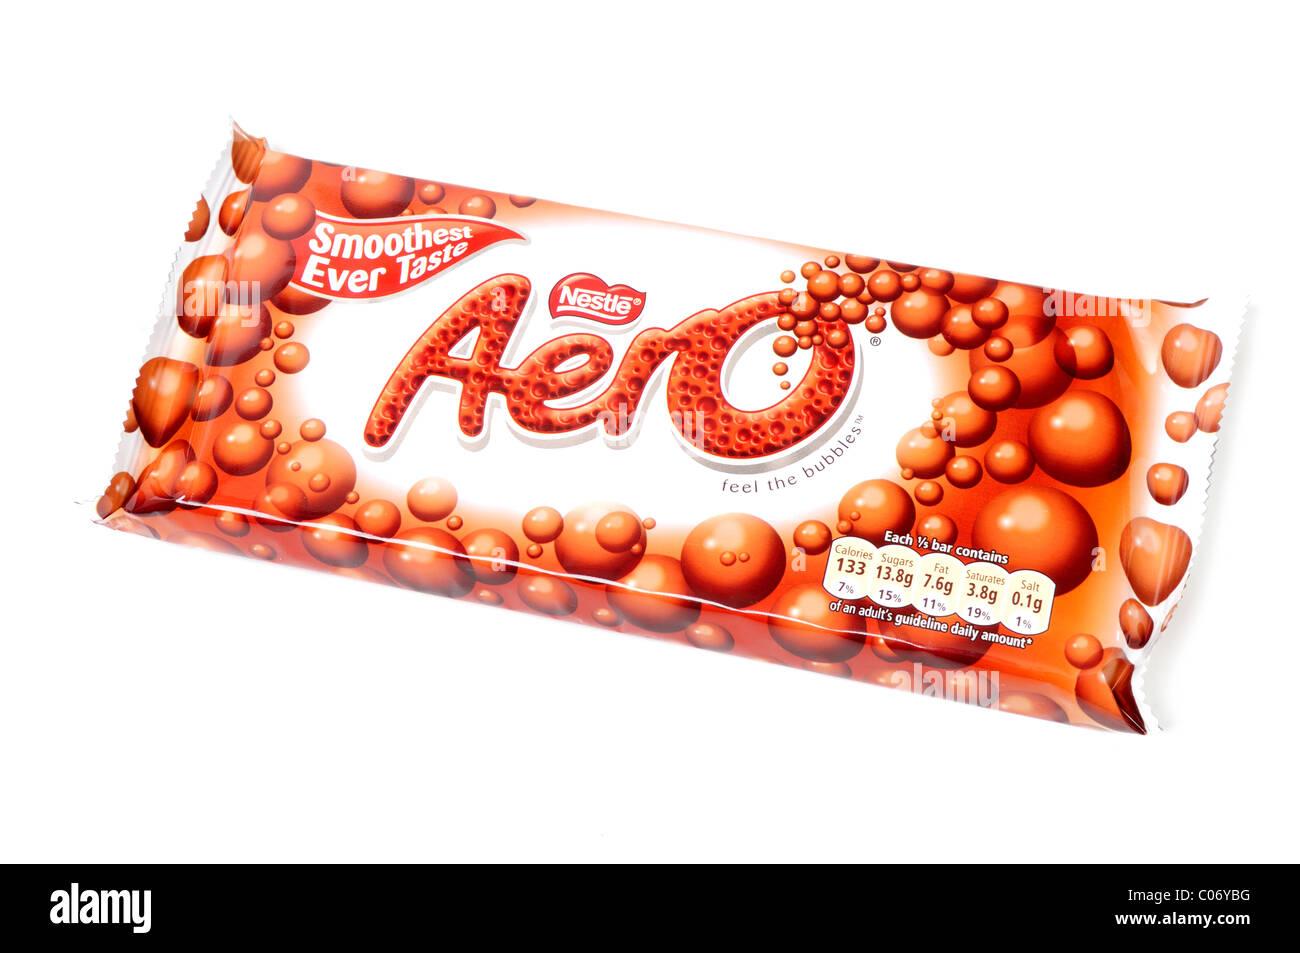 Aero Chocolate Bar. - Stock Image